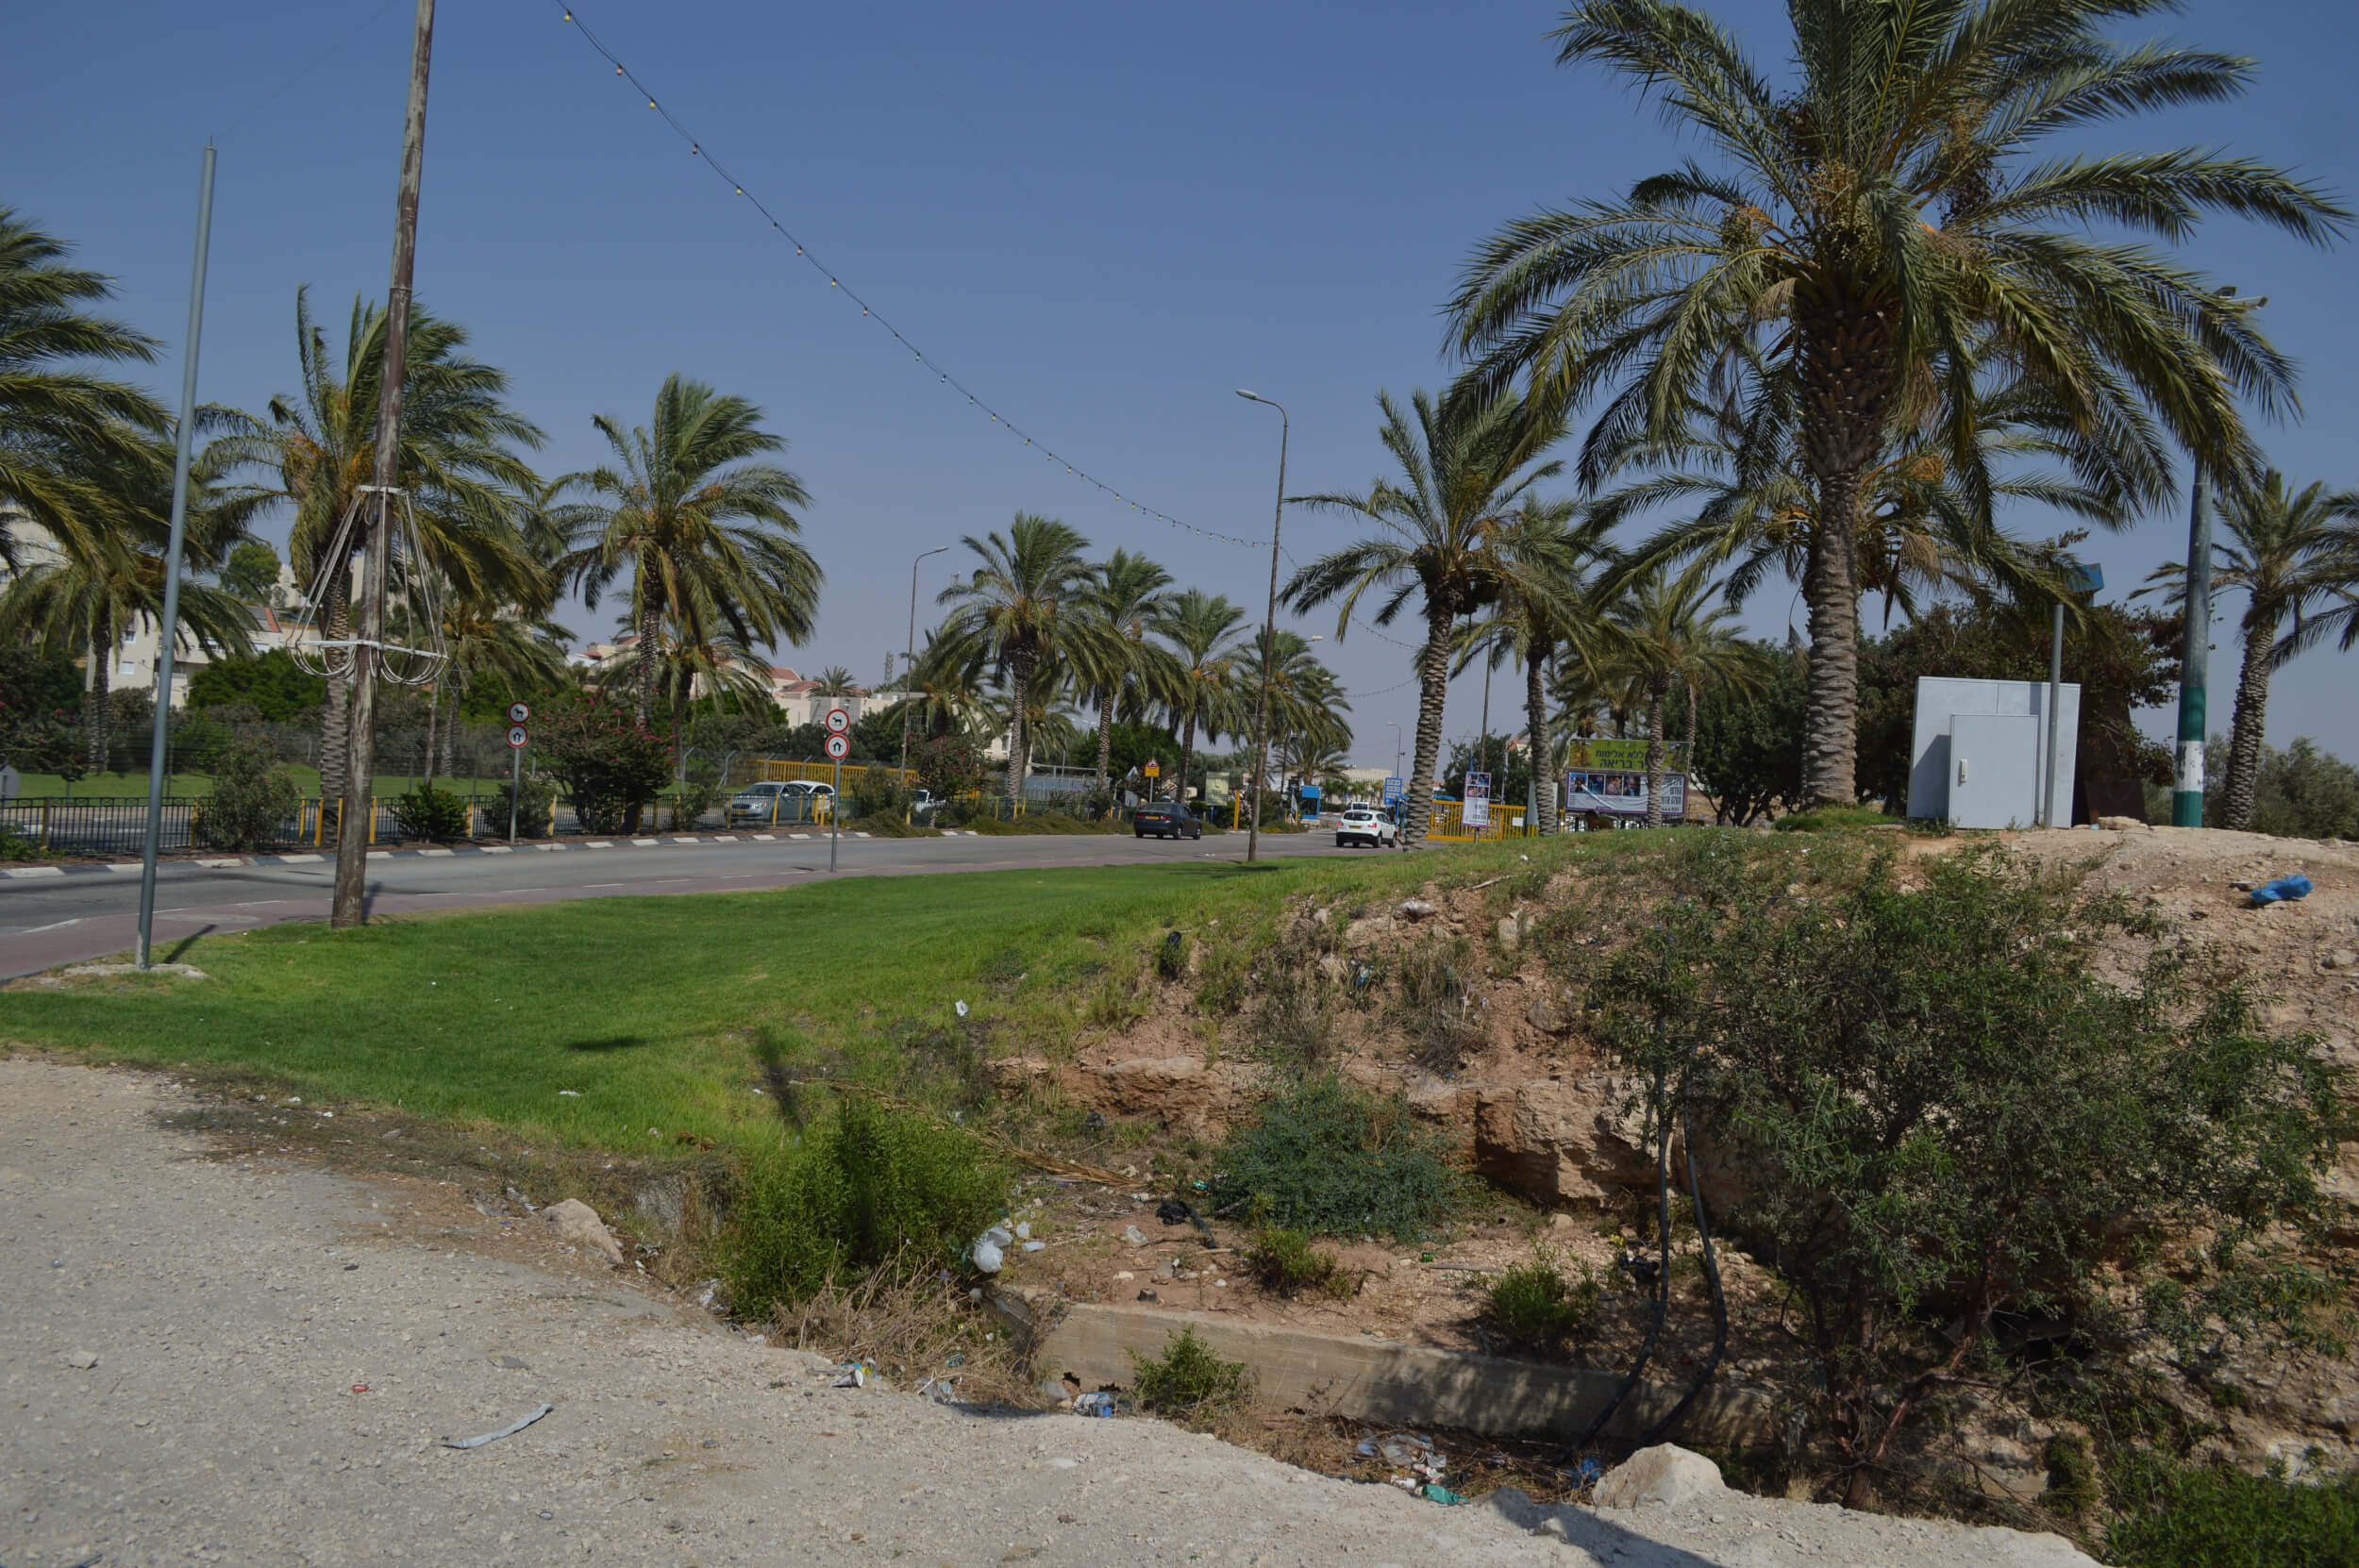 The entrance to Ma'ale Adumim. (Photo: Lydia Noon)